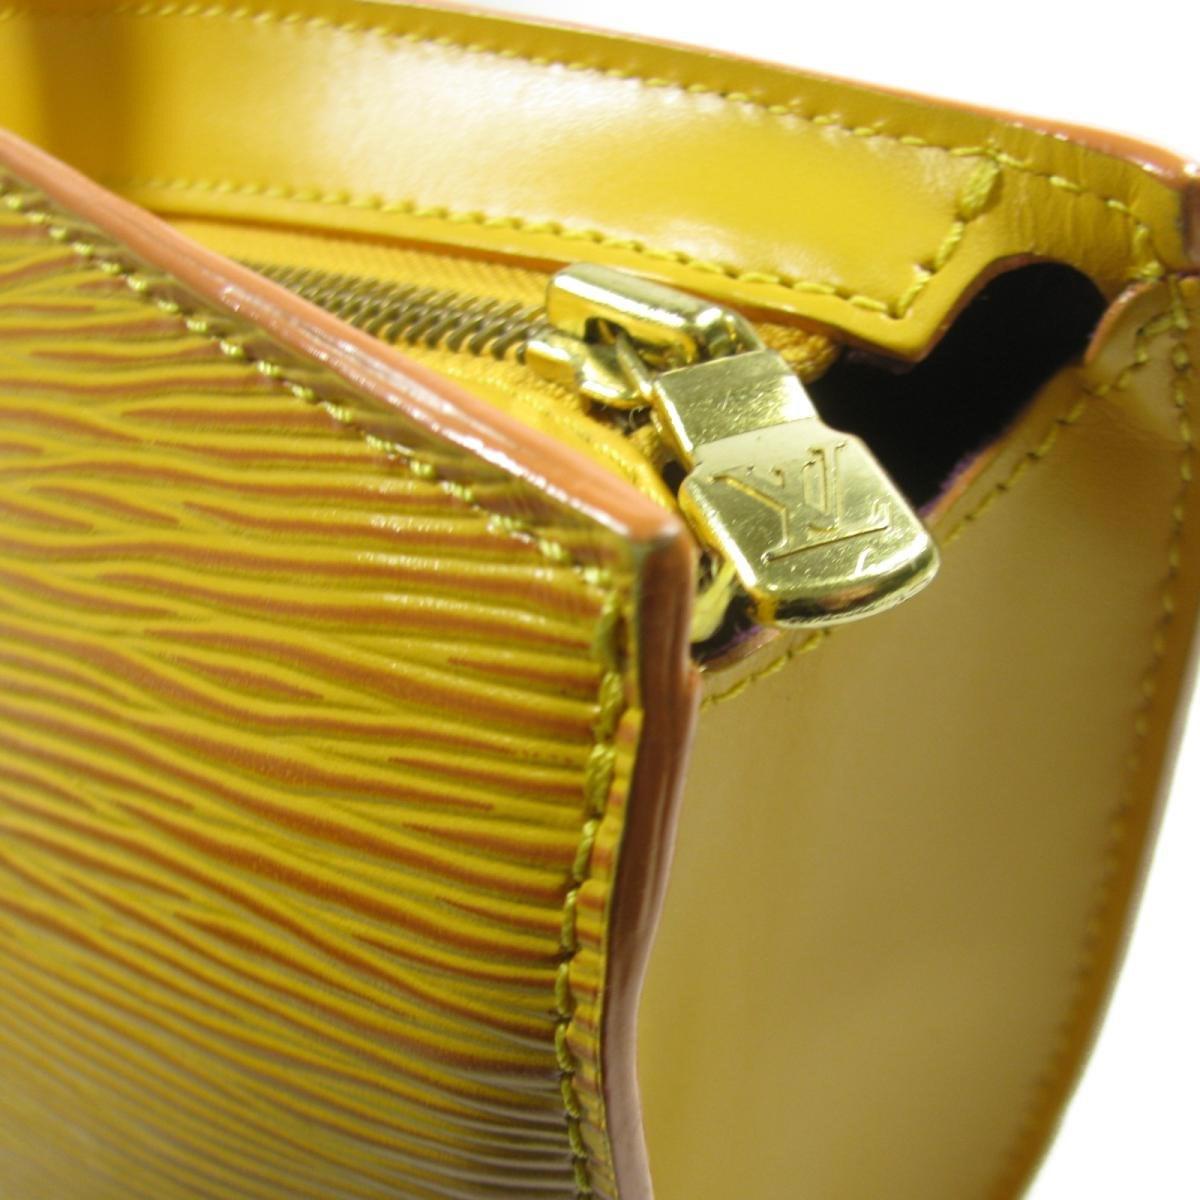 1f892e57fadc Louis Vuitton - Auth Saint Jacques Handbag M52269 Epi Leather Tassili Yellow  Used - Lyst